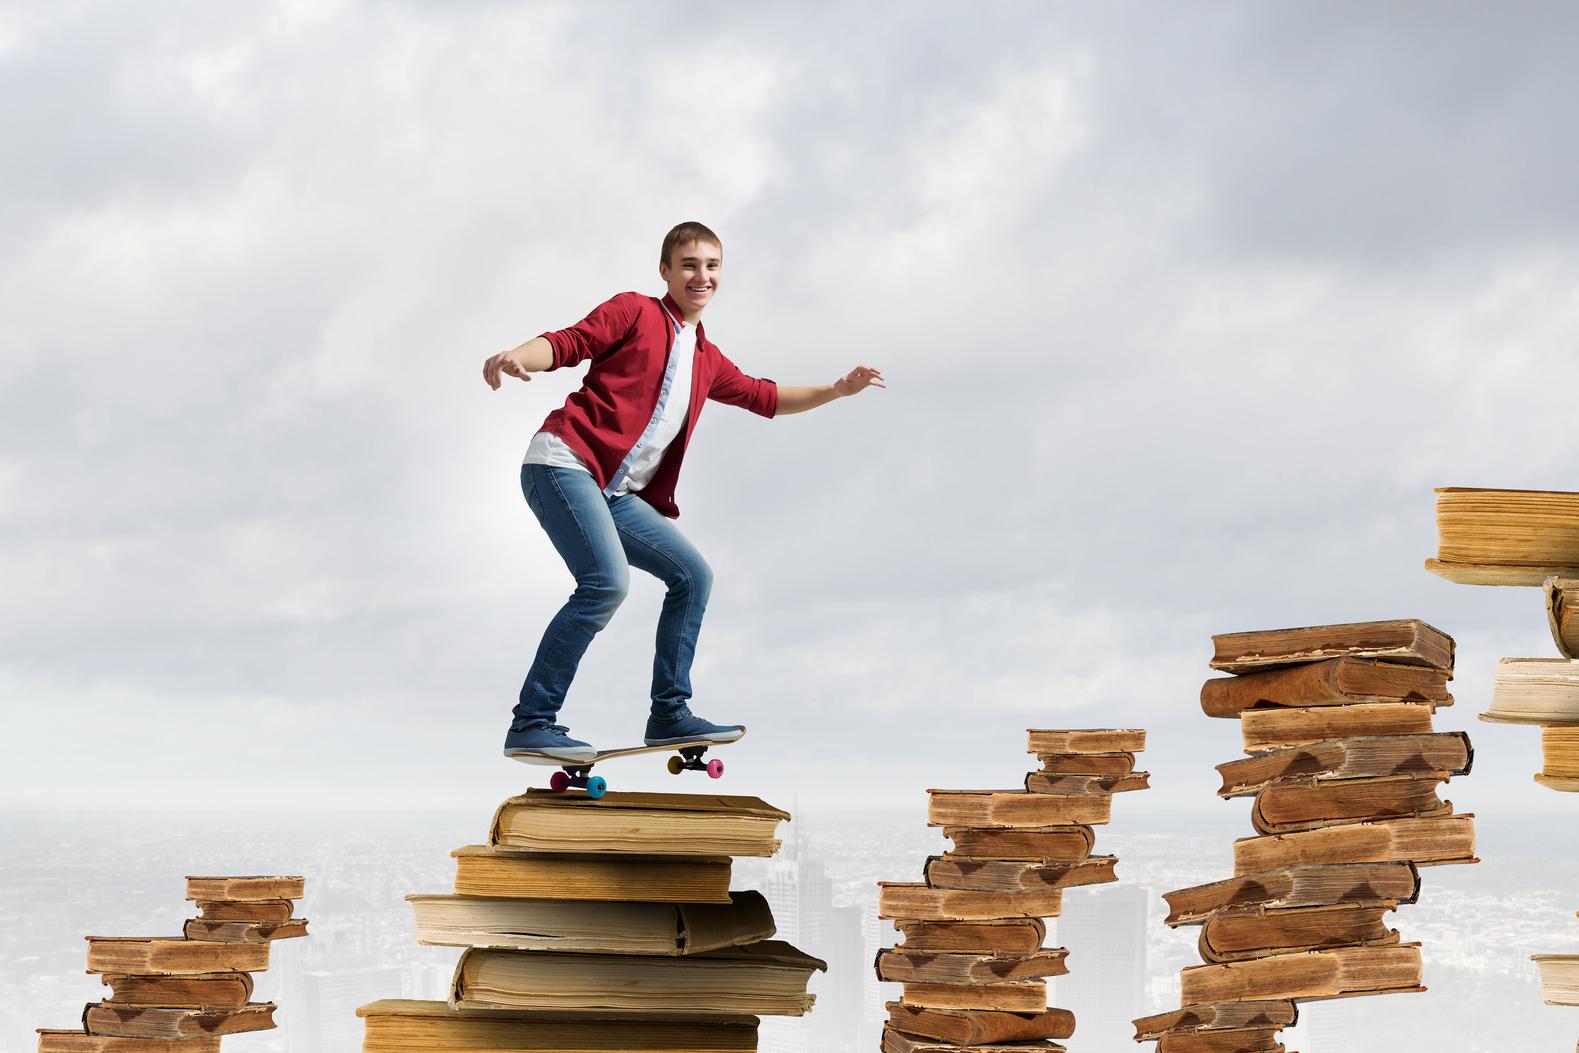 Handsome teenager acive boy riding skateboard on books